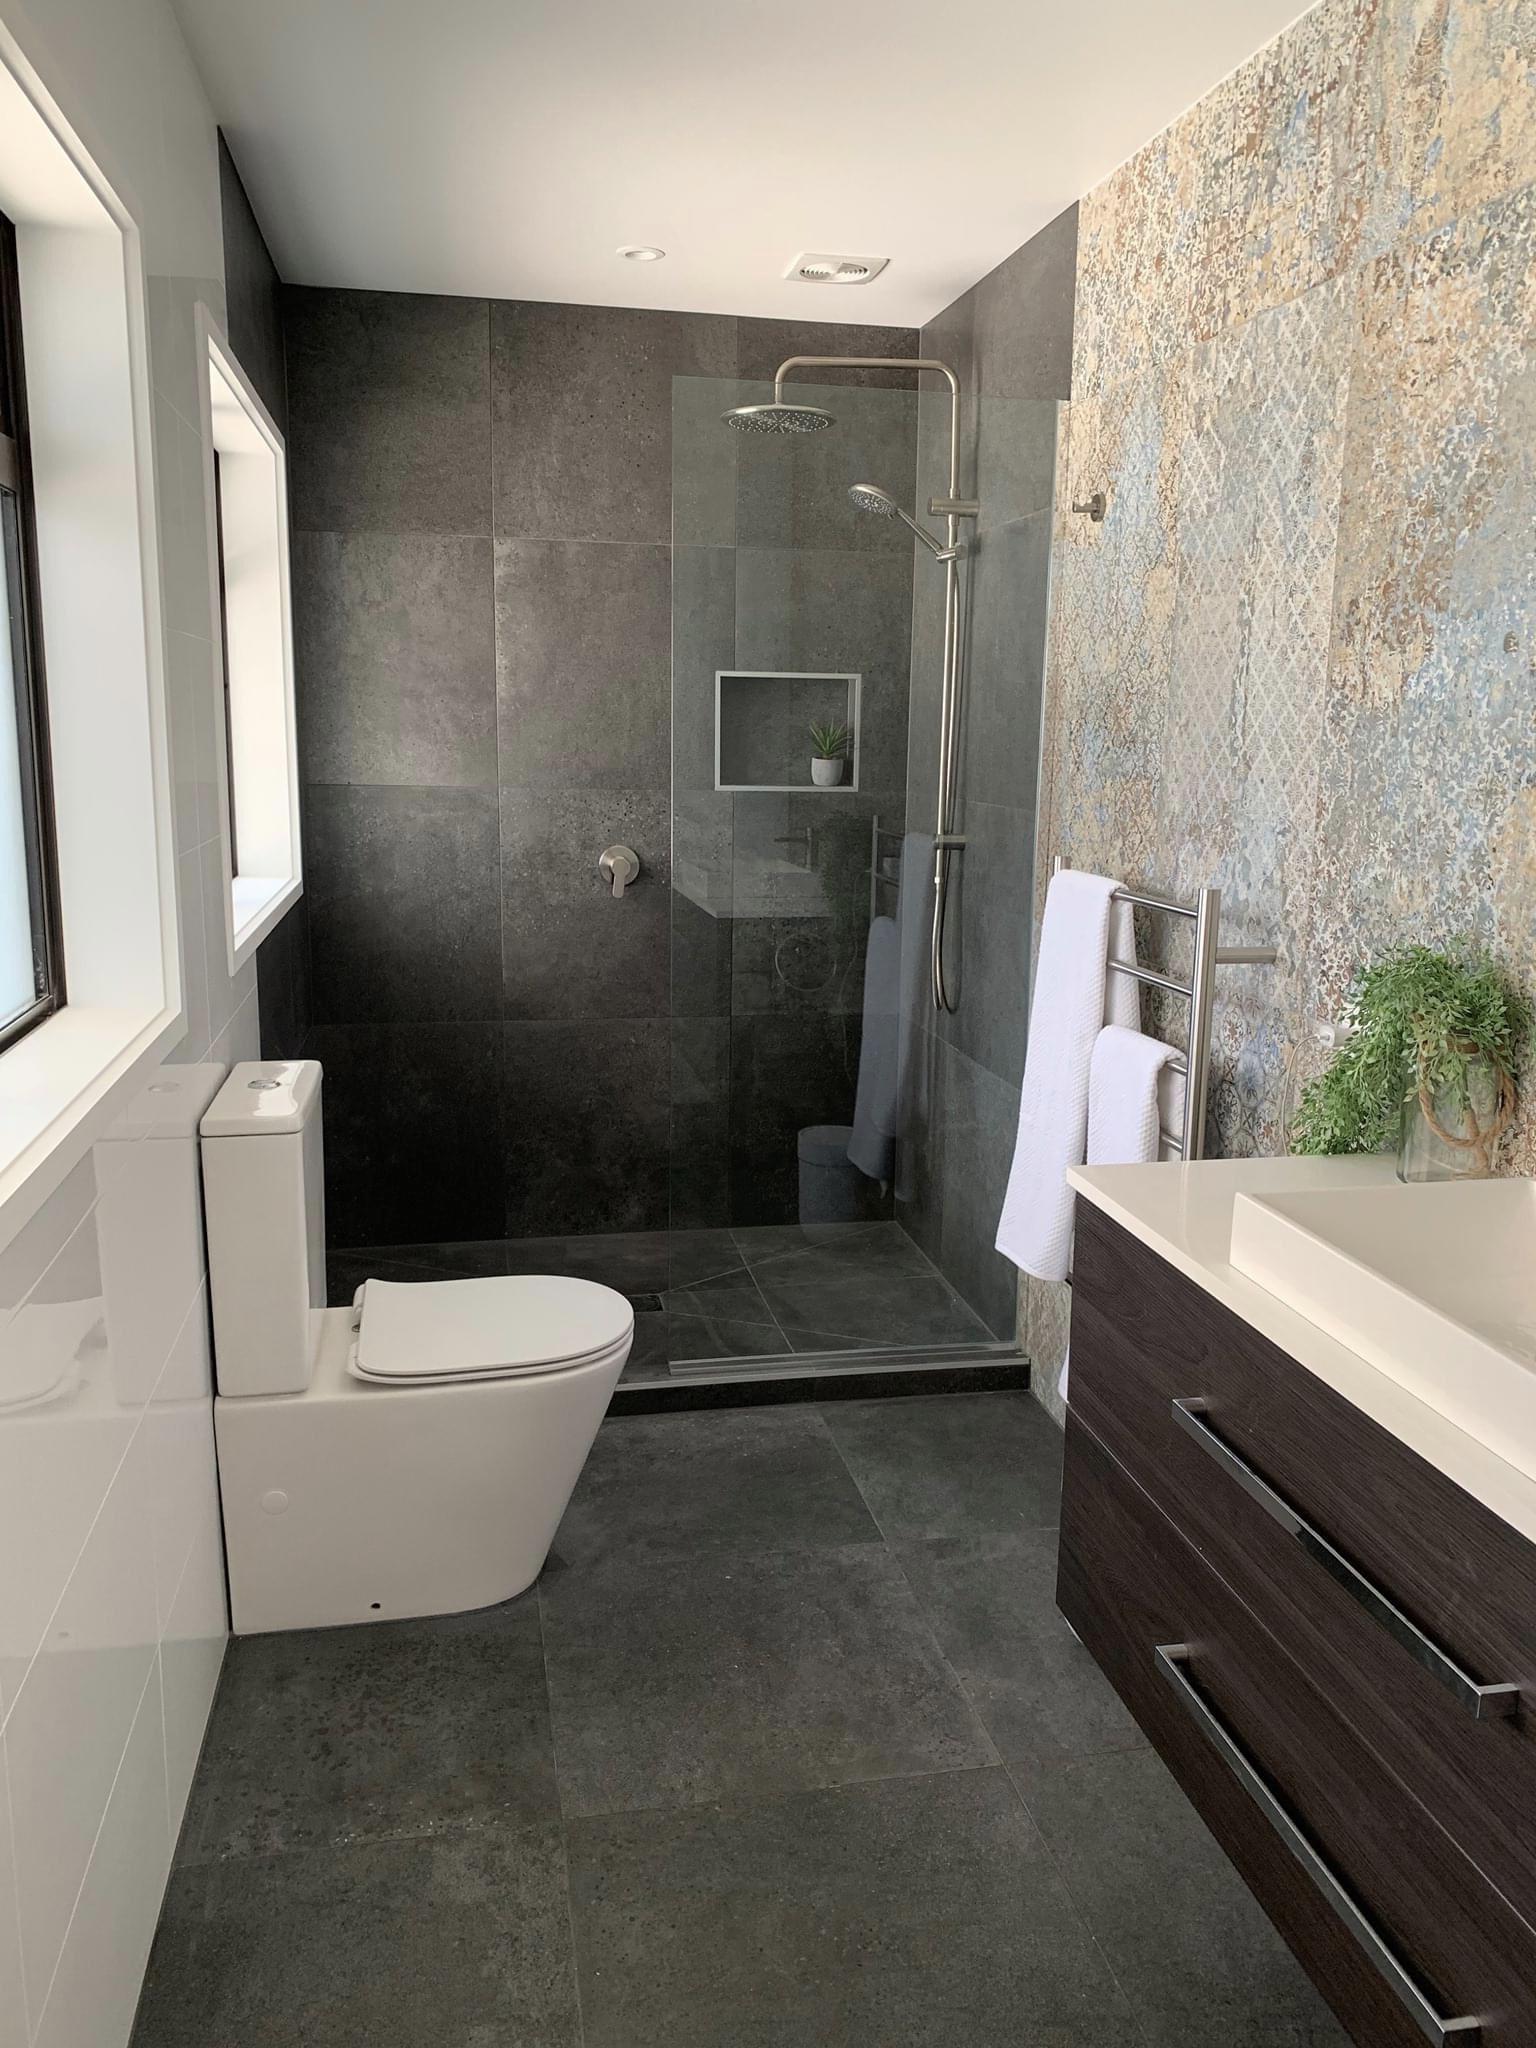 Newly renovated bathroom toilet